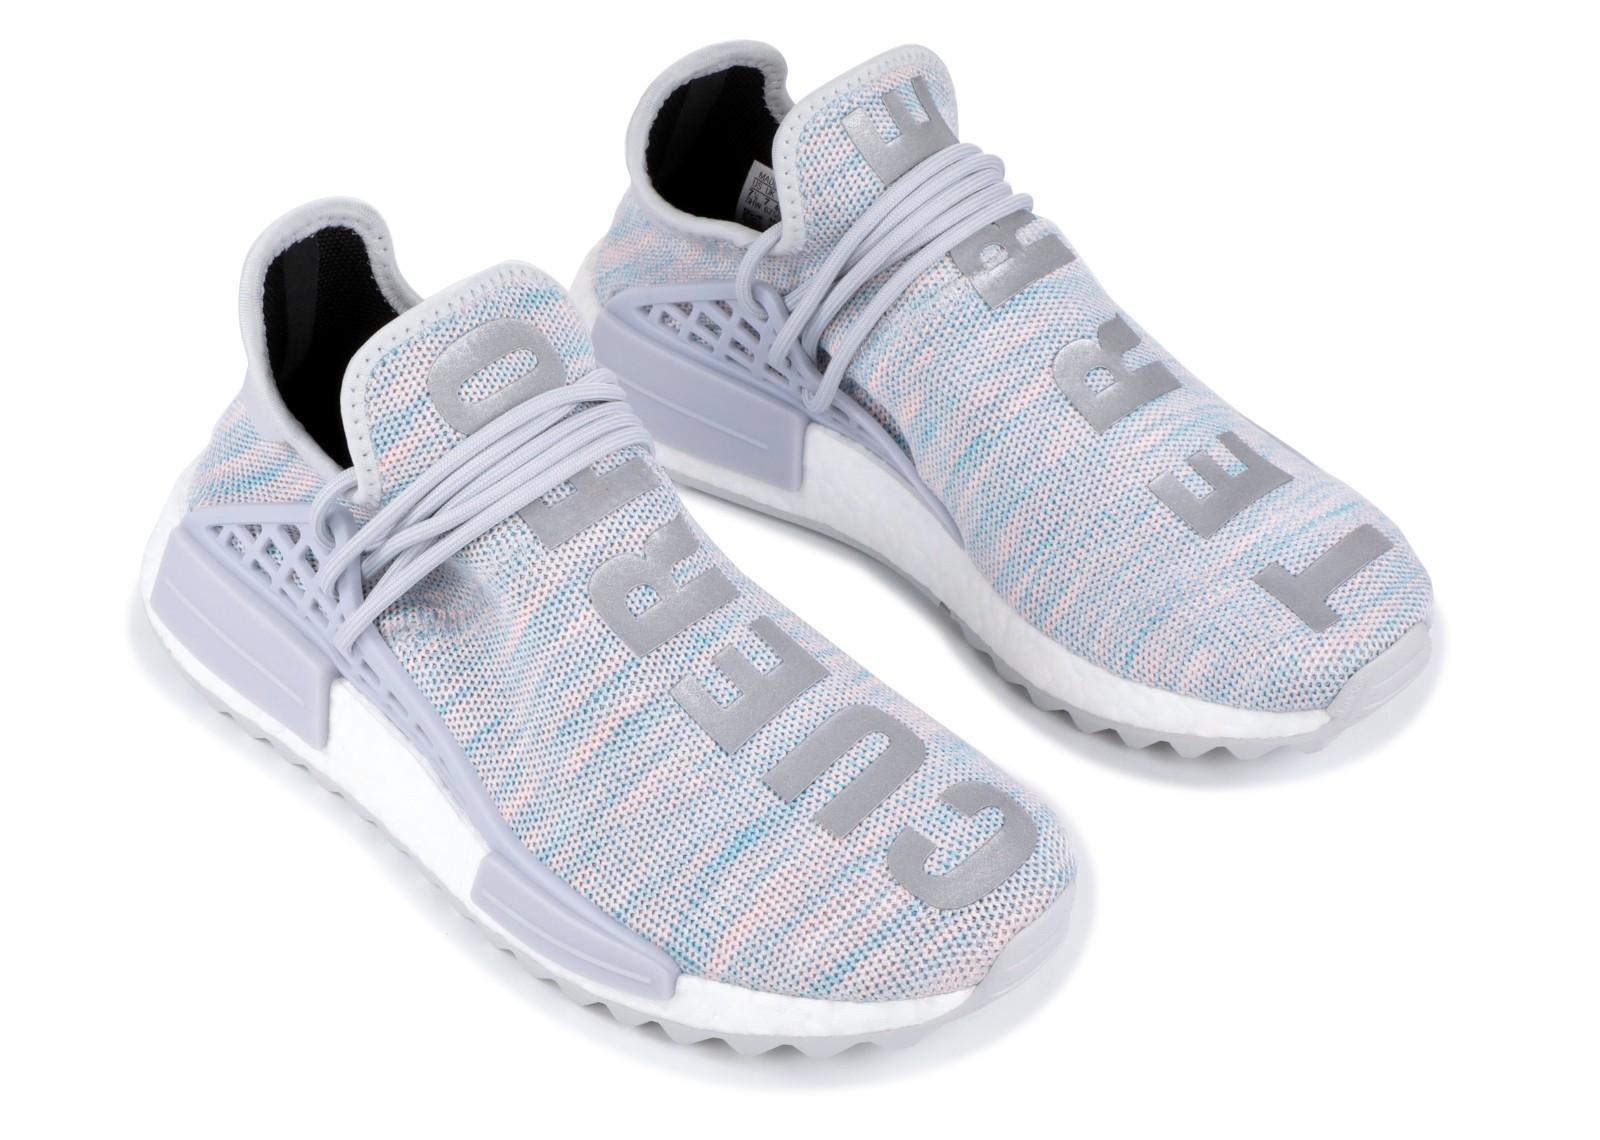 on sale a990c a33da Kick Avenue - Authentic Sneakers